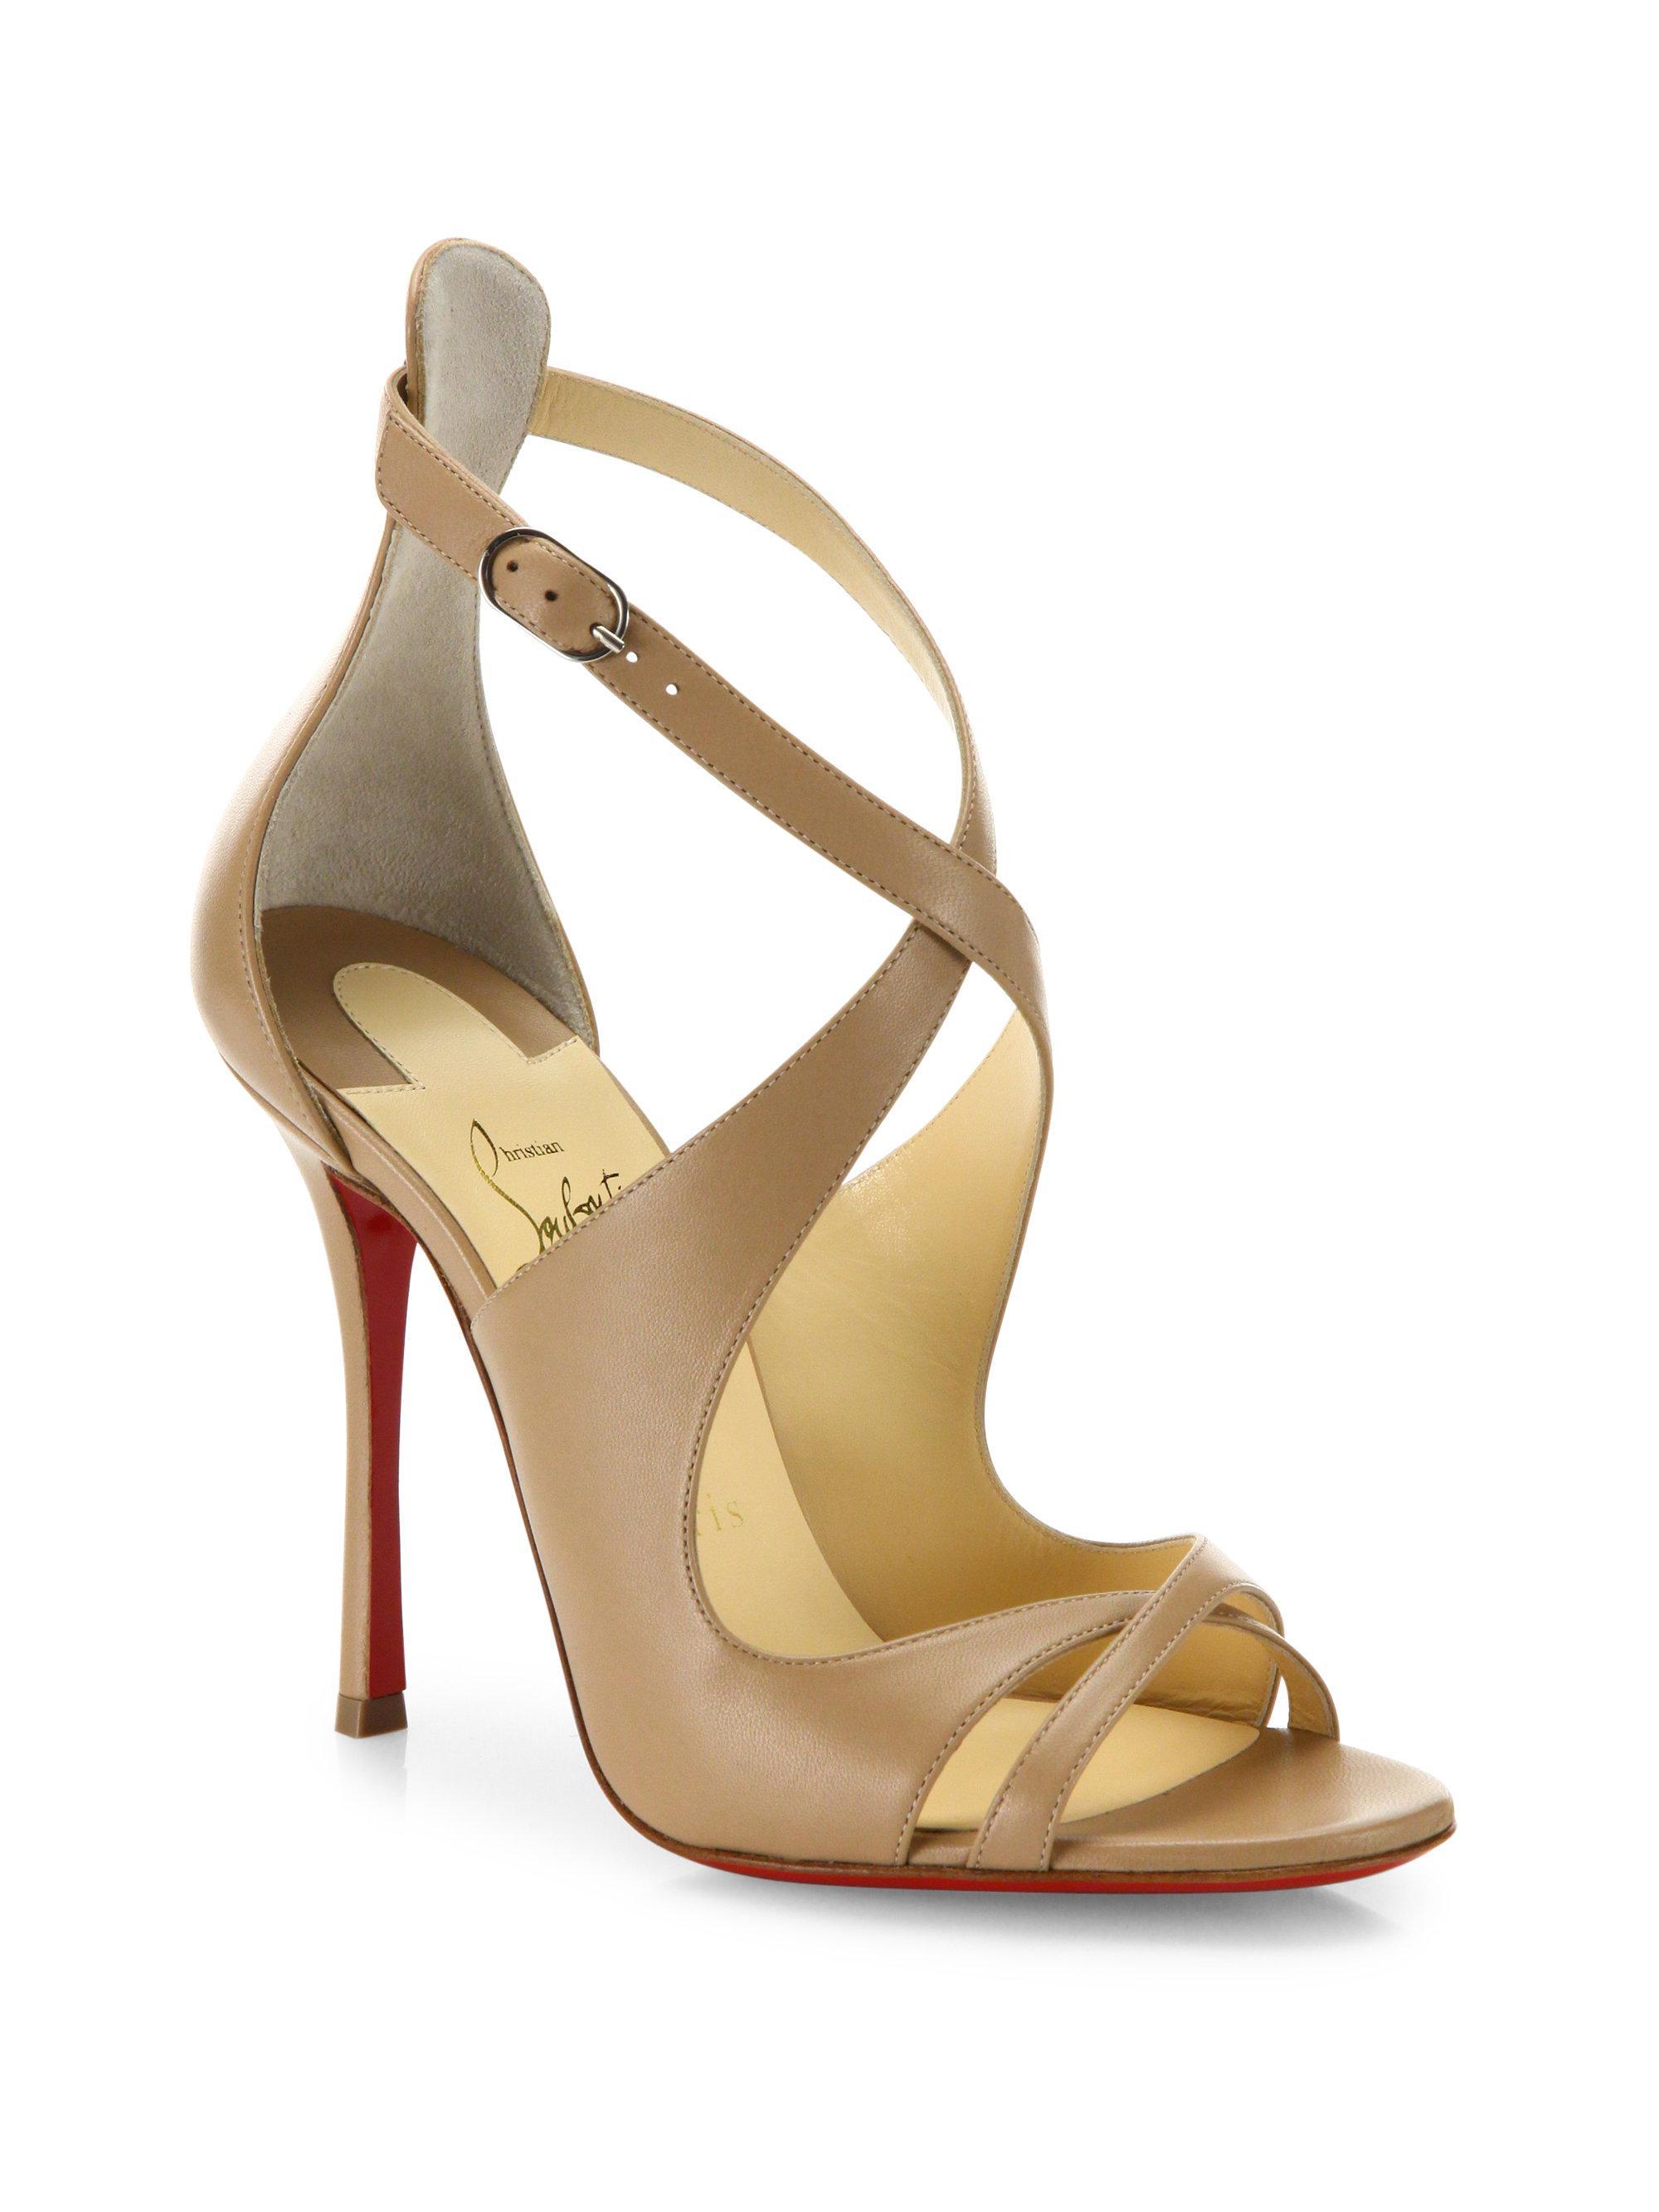 on sale c1cee ea175 Christian Louboutin Metallic Malefissima Leather Sandals